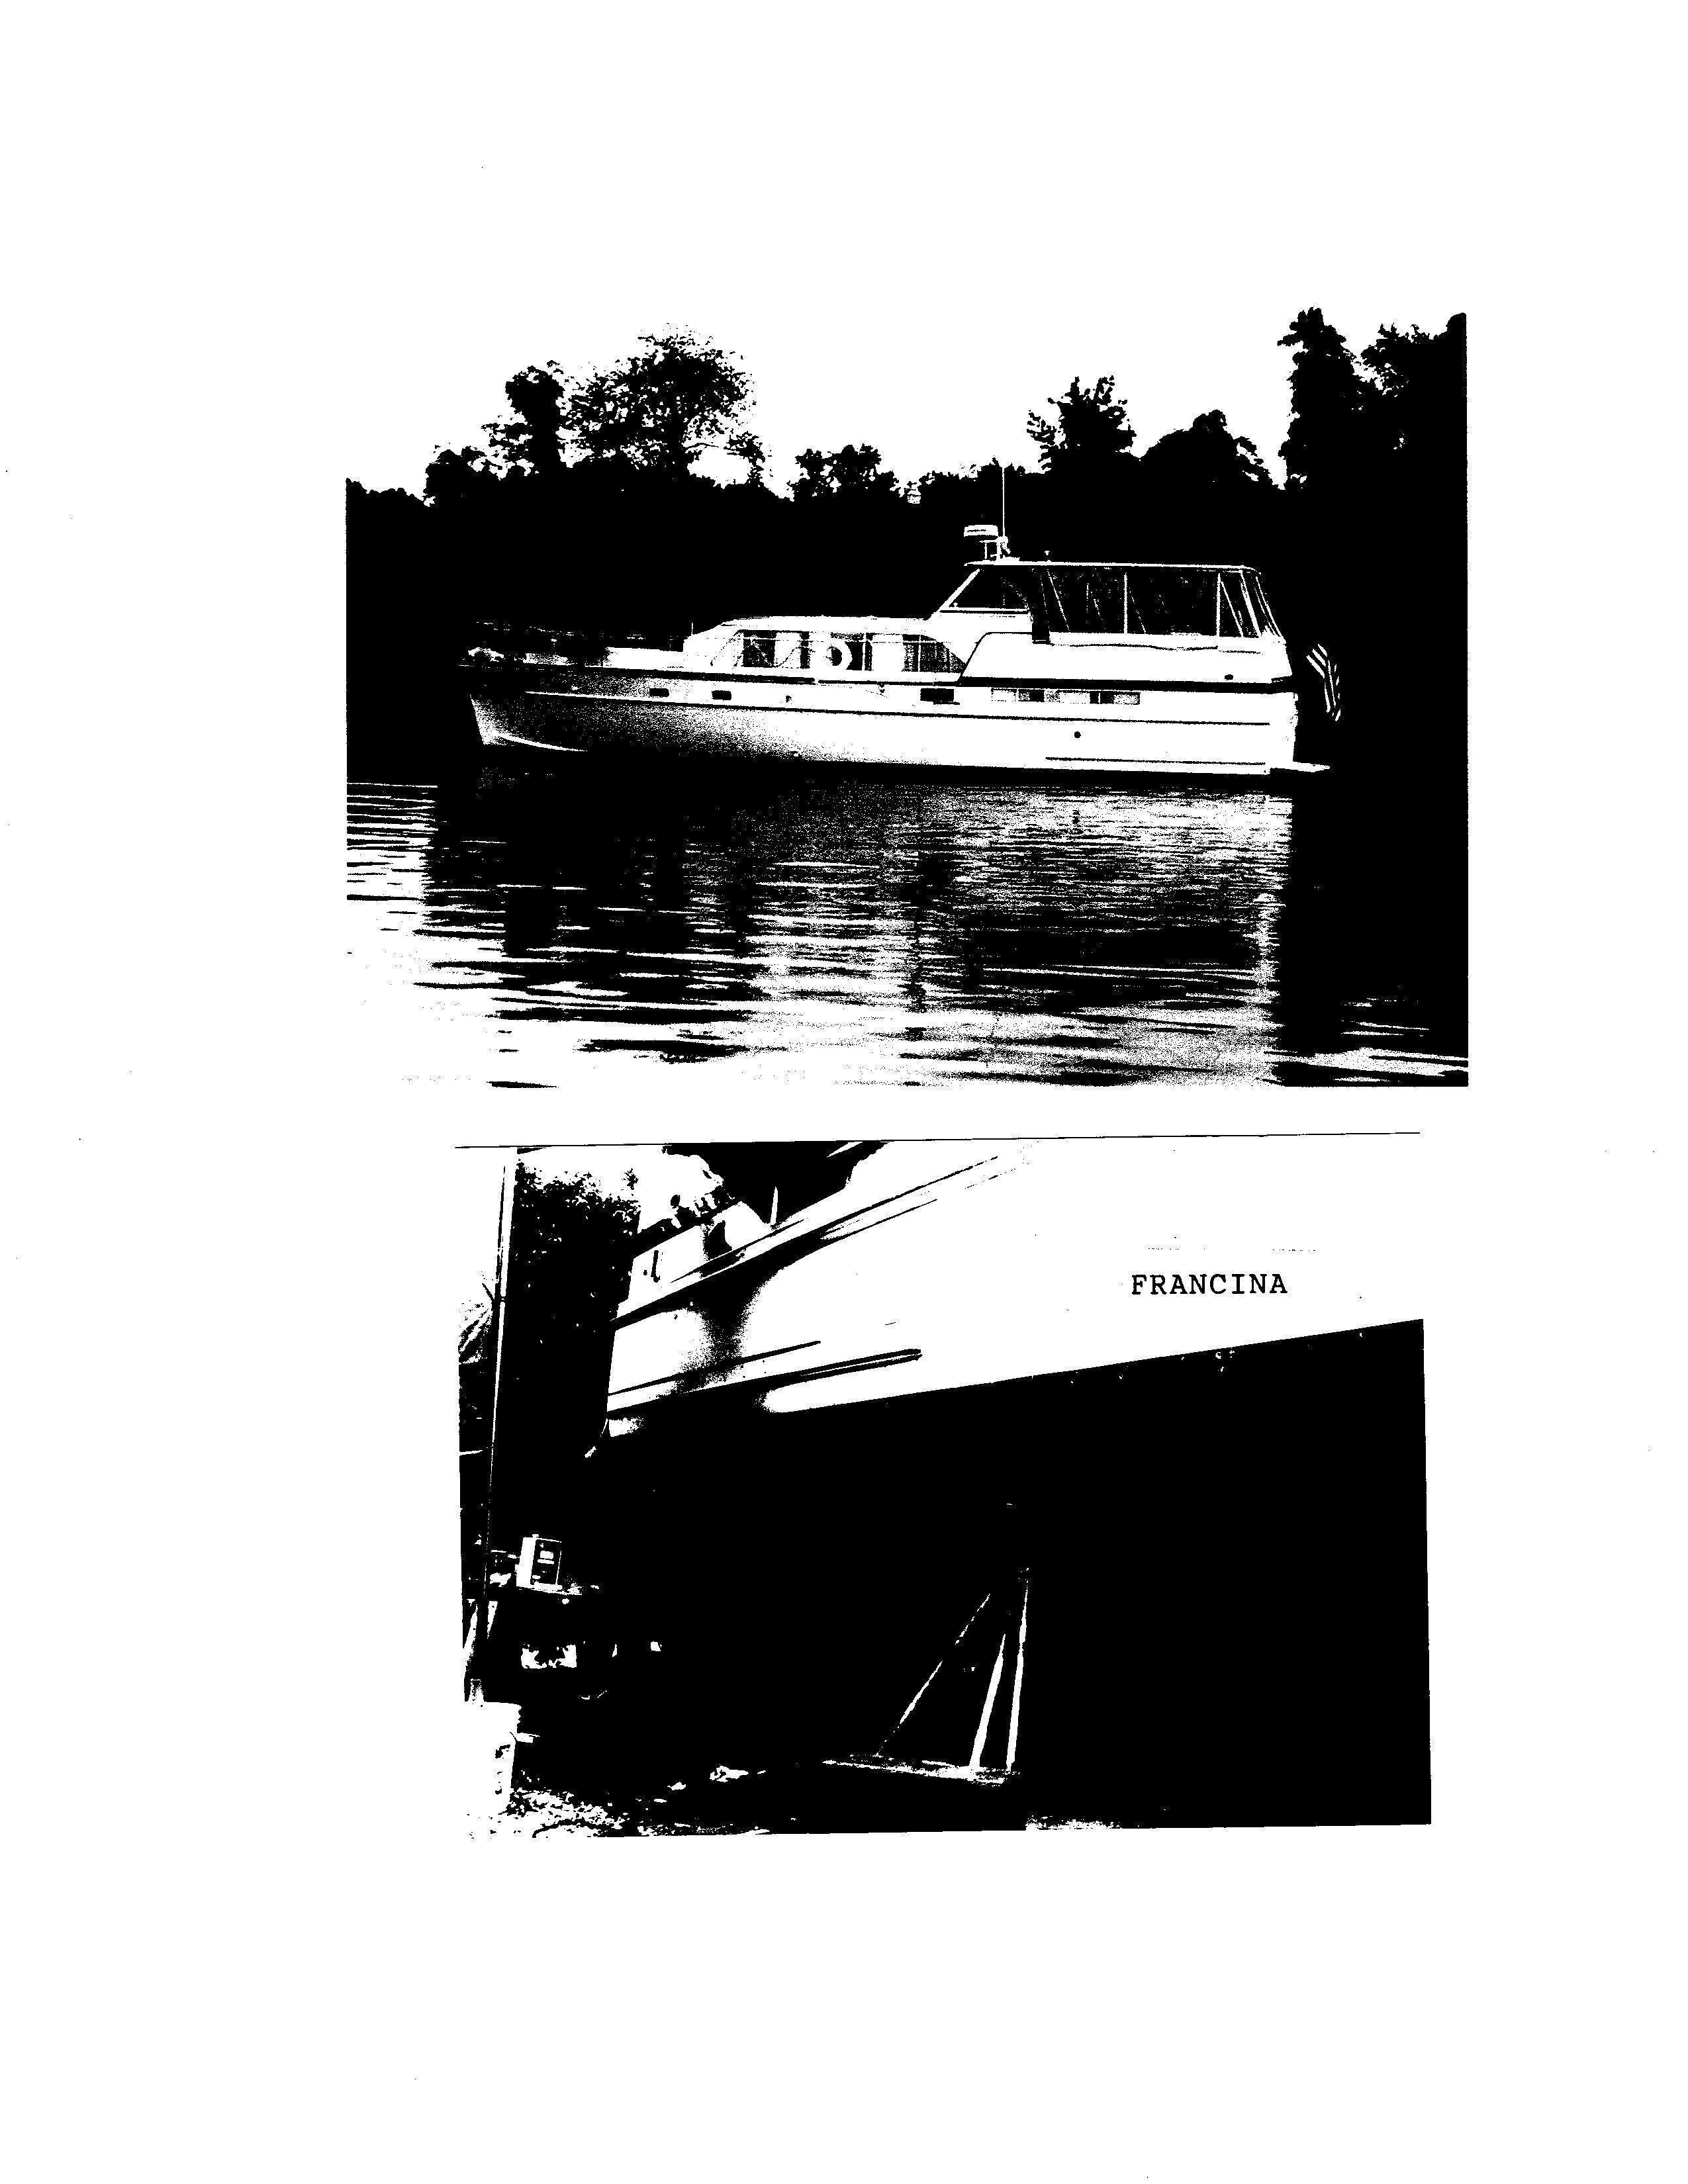 Matthews Tri-Cabin Motoryacht, Grasonville,.